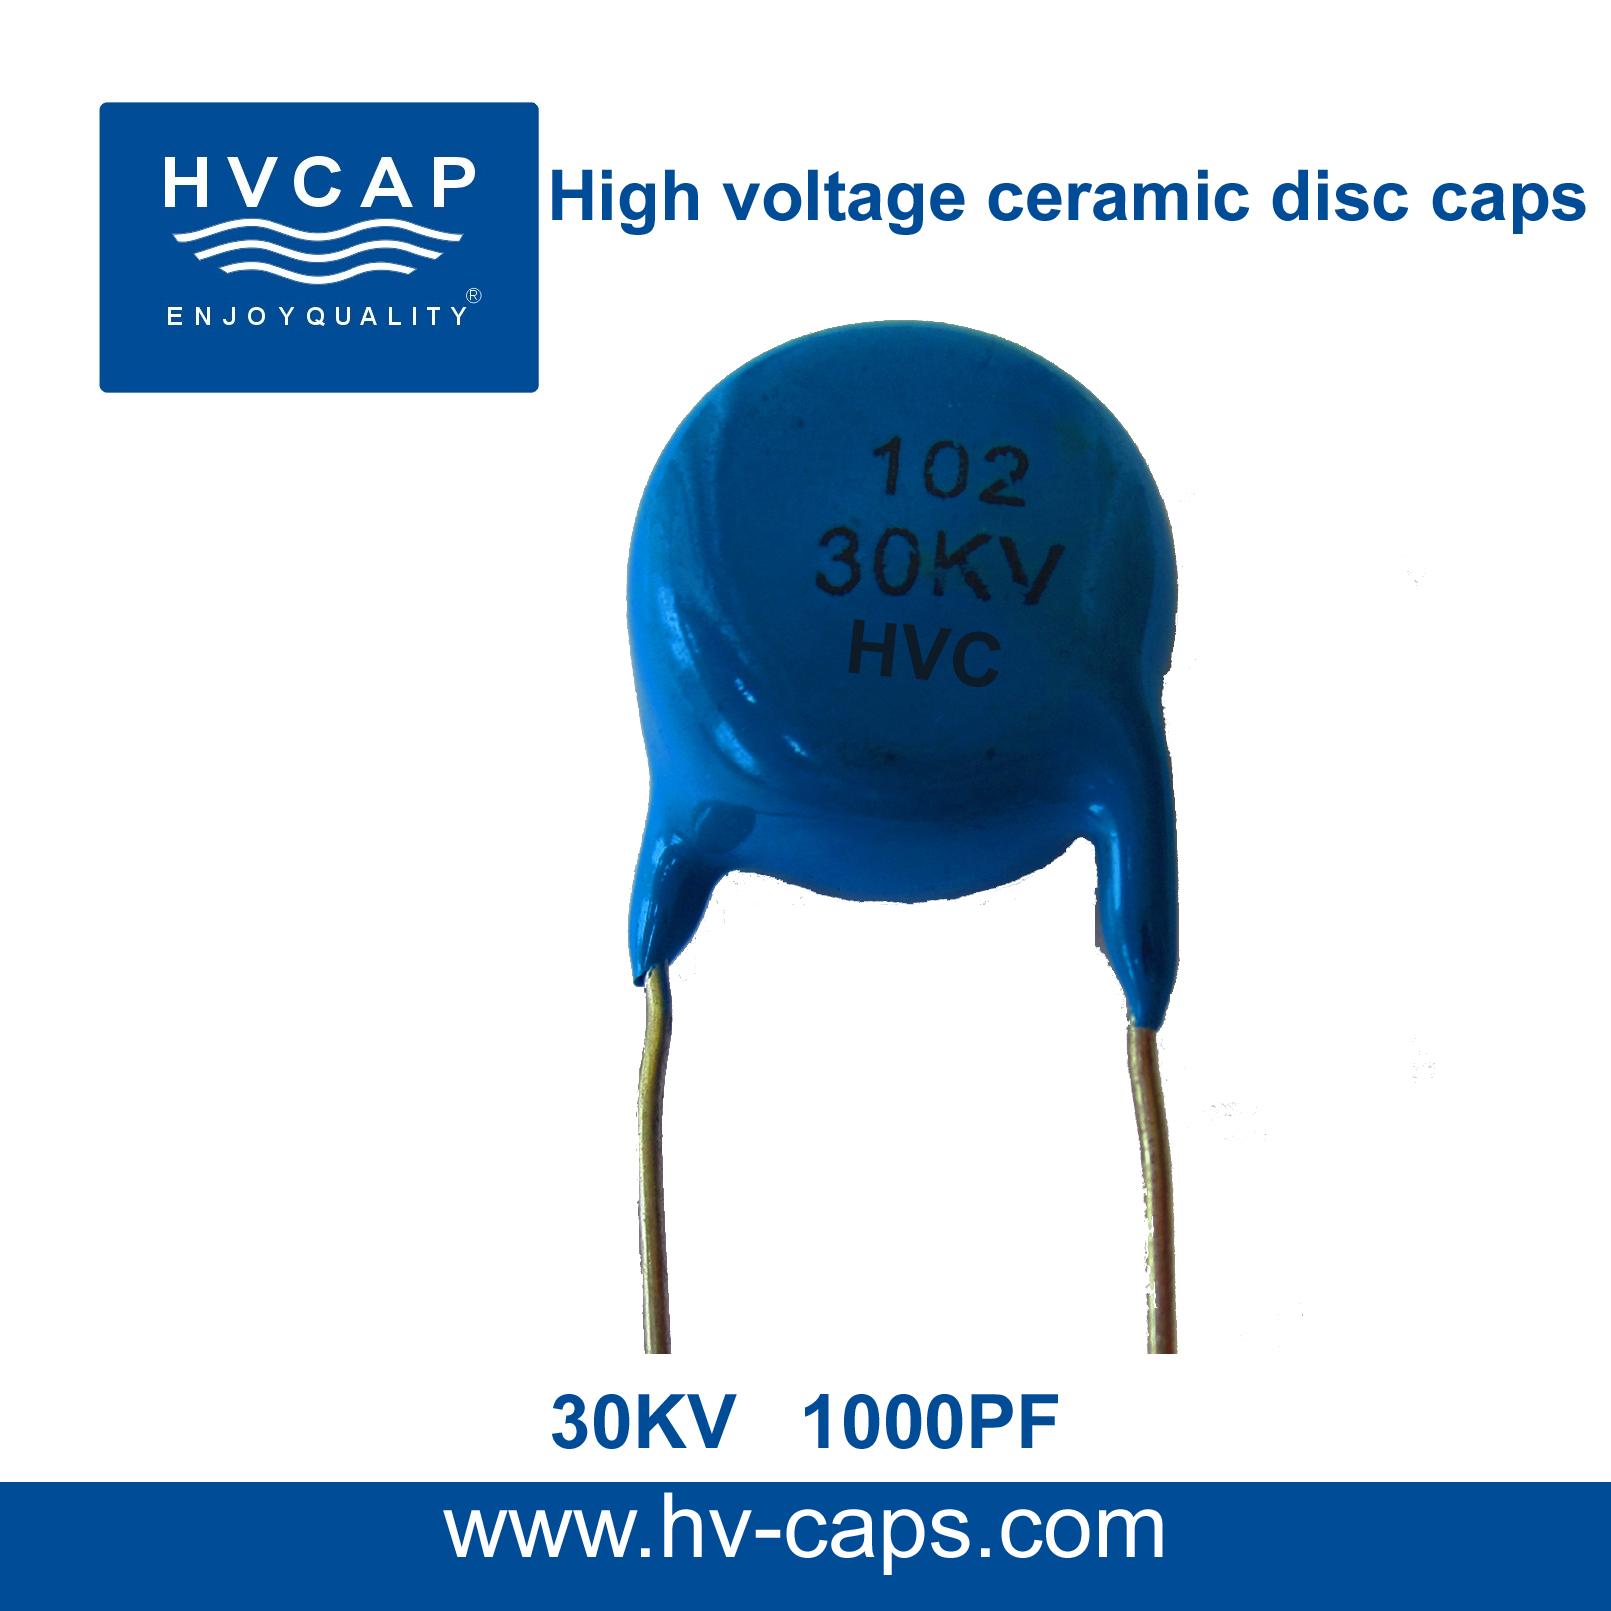 Hoë Spanning Keramiese Skyfkondensator 30KV 1000PF (30KV 102M)